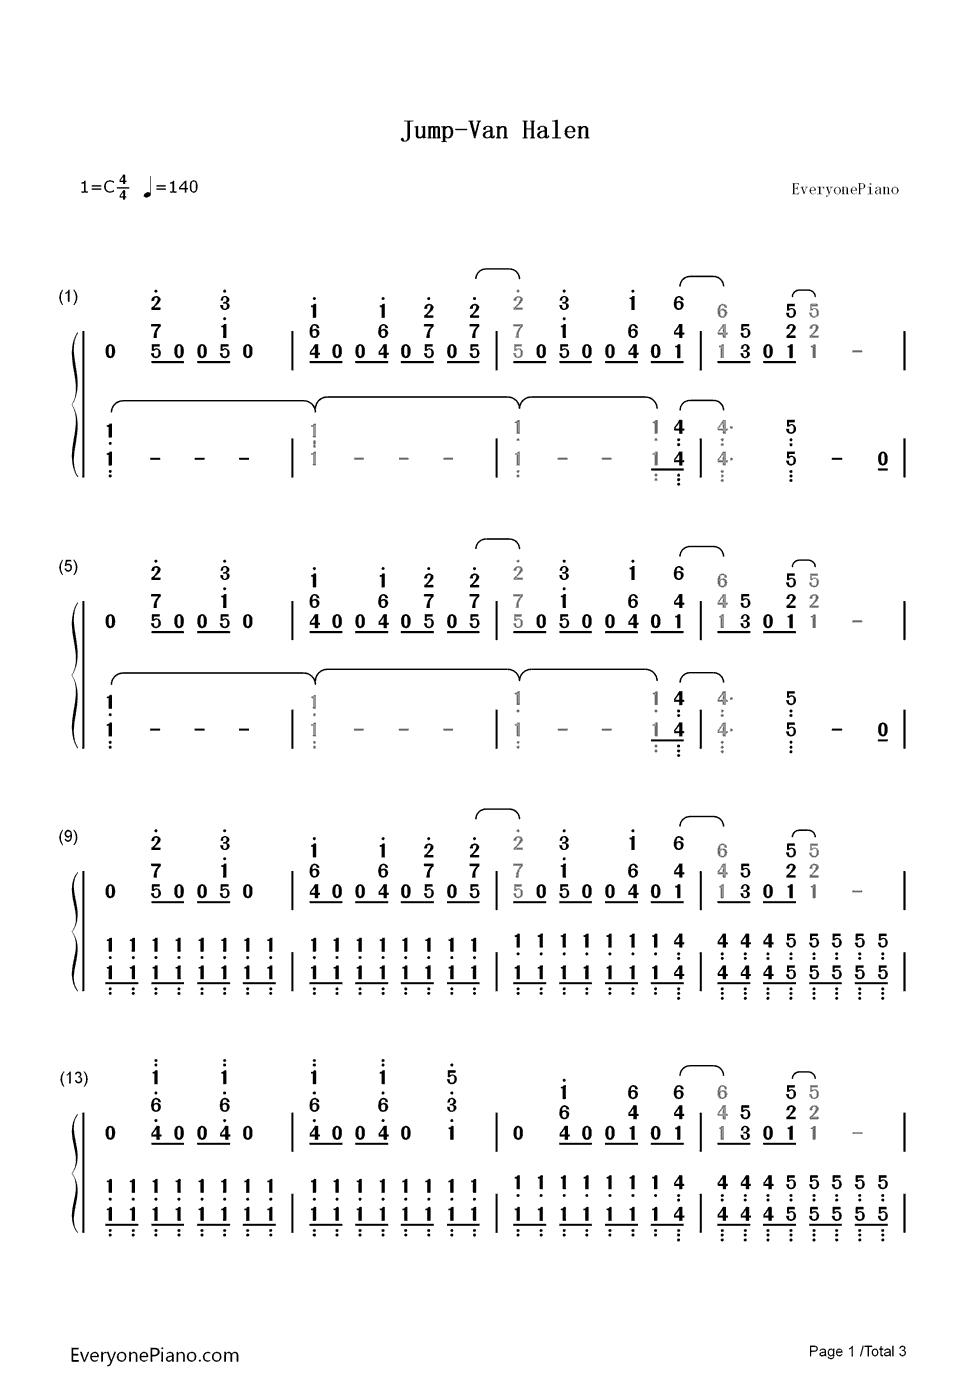 Jump van halen numbered musical notation preview 1 free piano listen now print sheet jump van halen numbered musical notation preview 1 hexwebz Choice Image